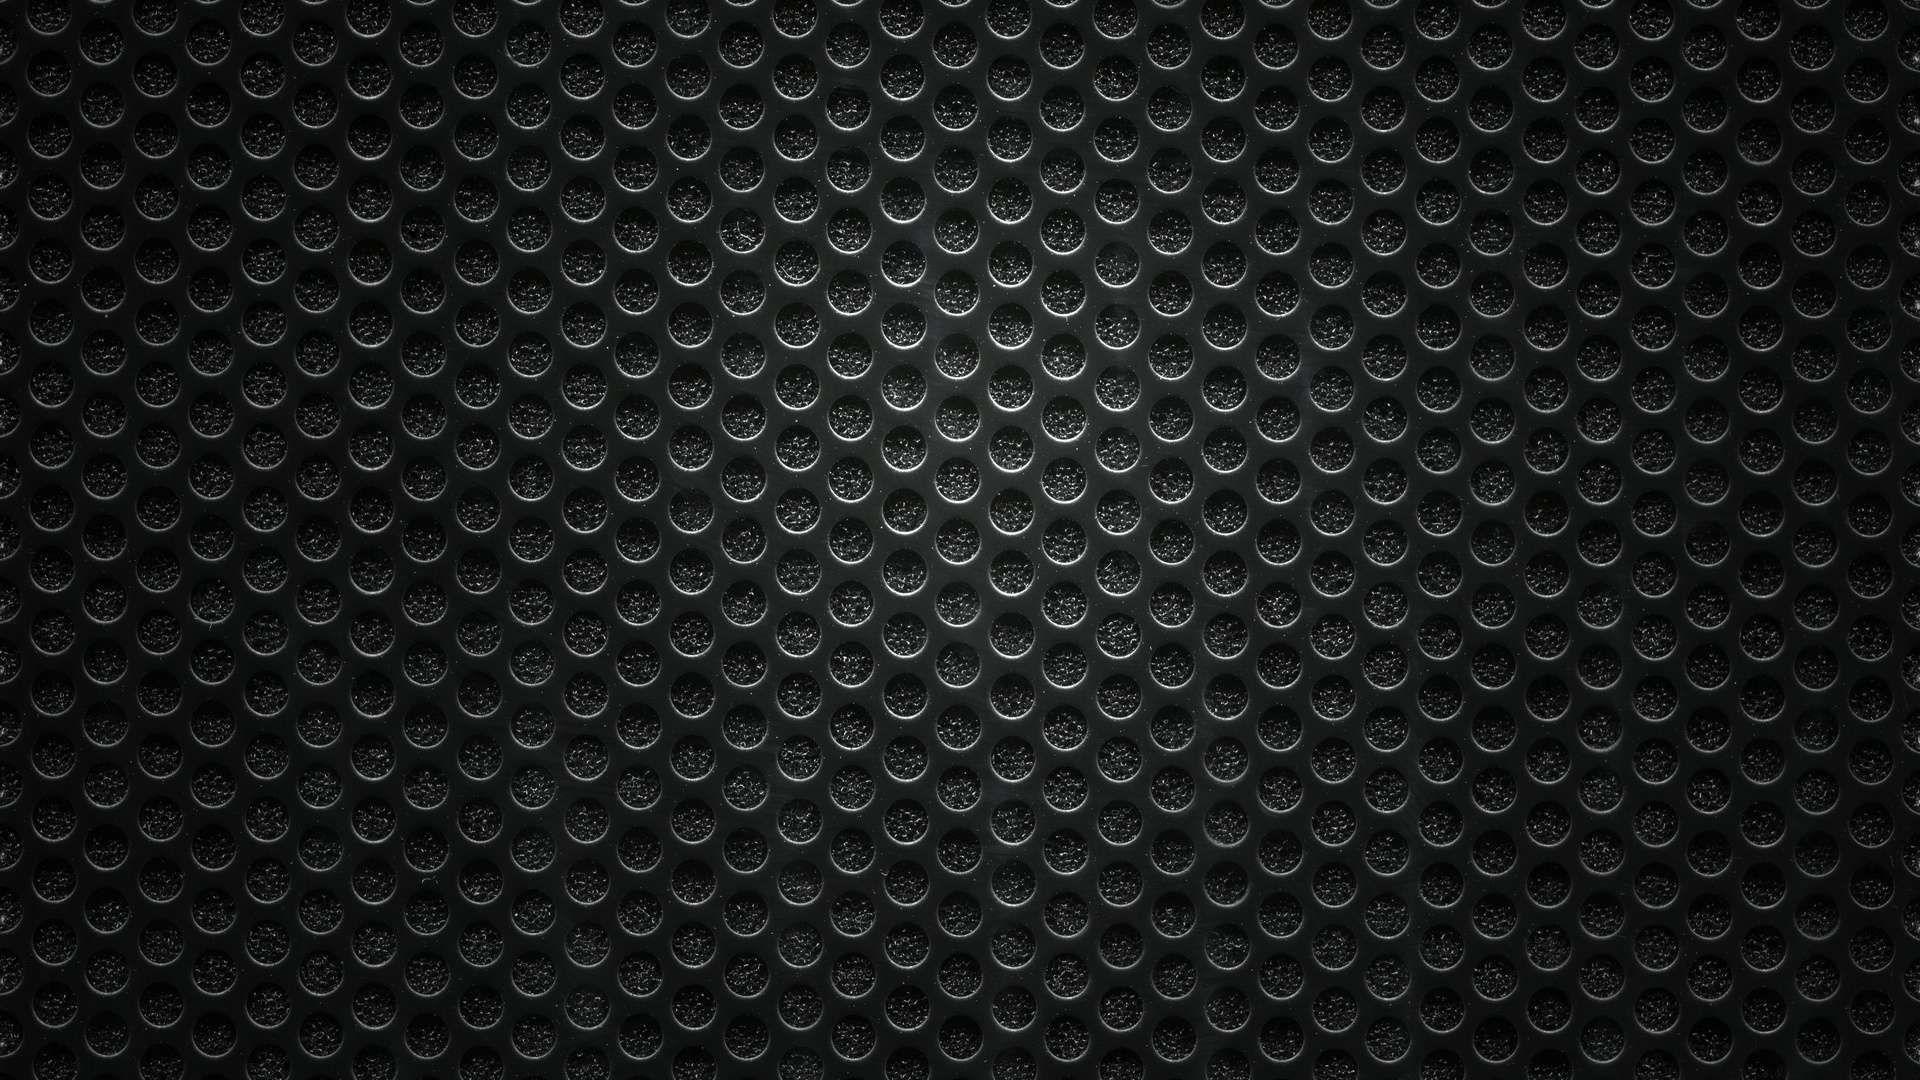 Black Background Texture Hd Wallpaper 1080p pat